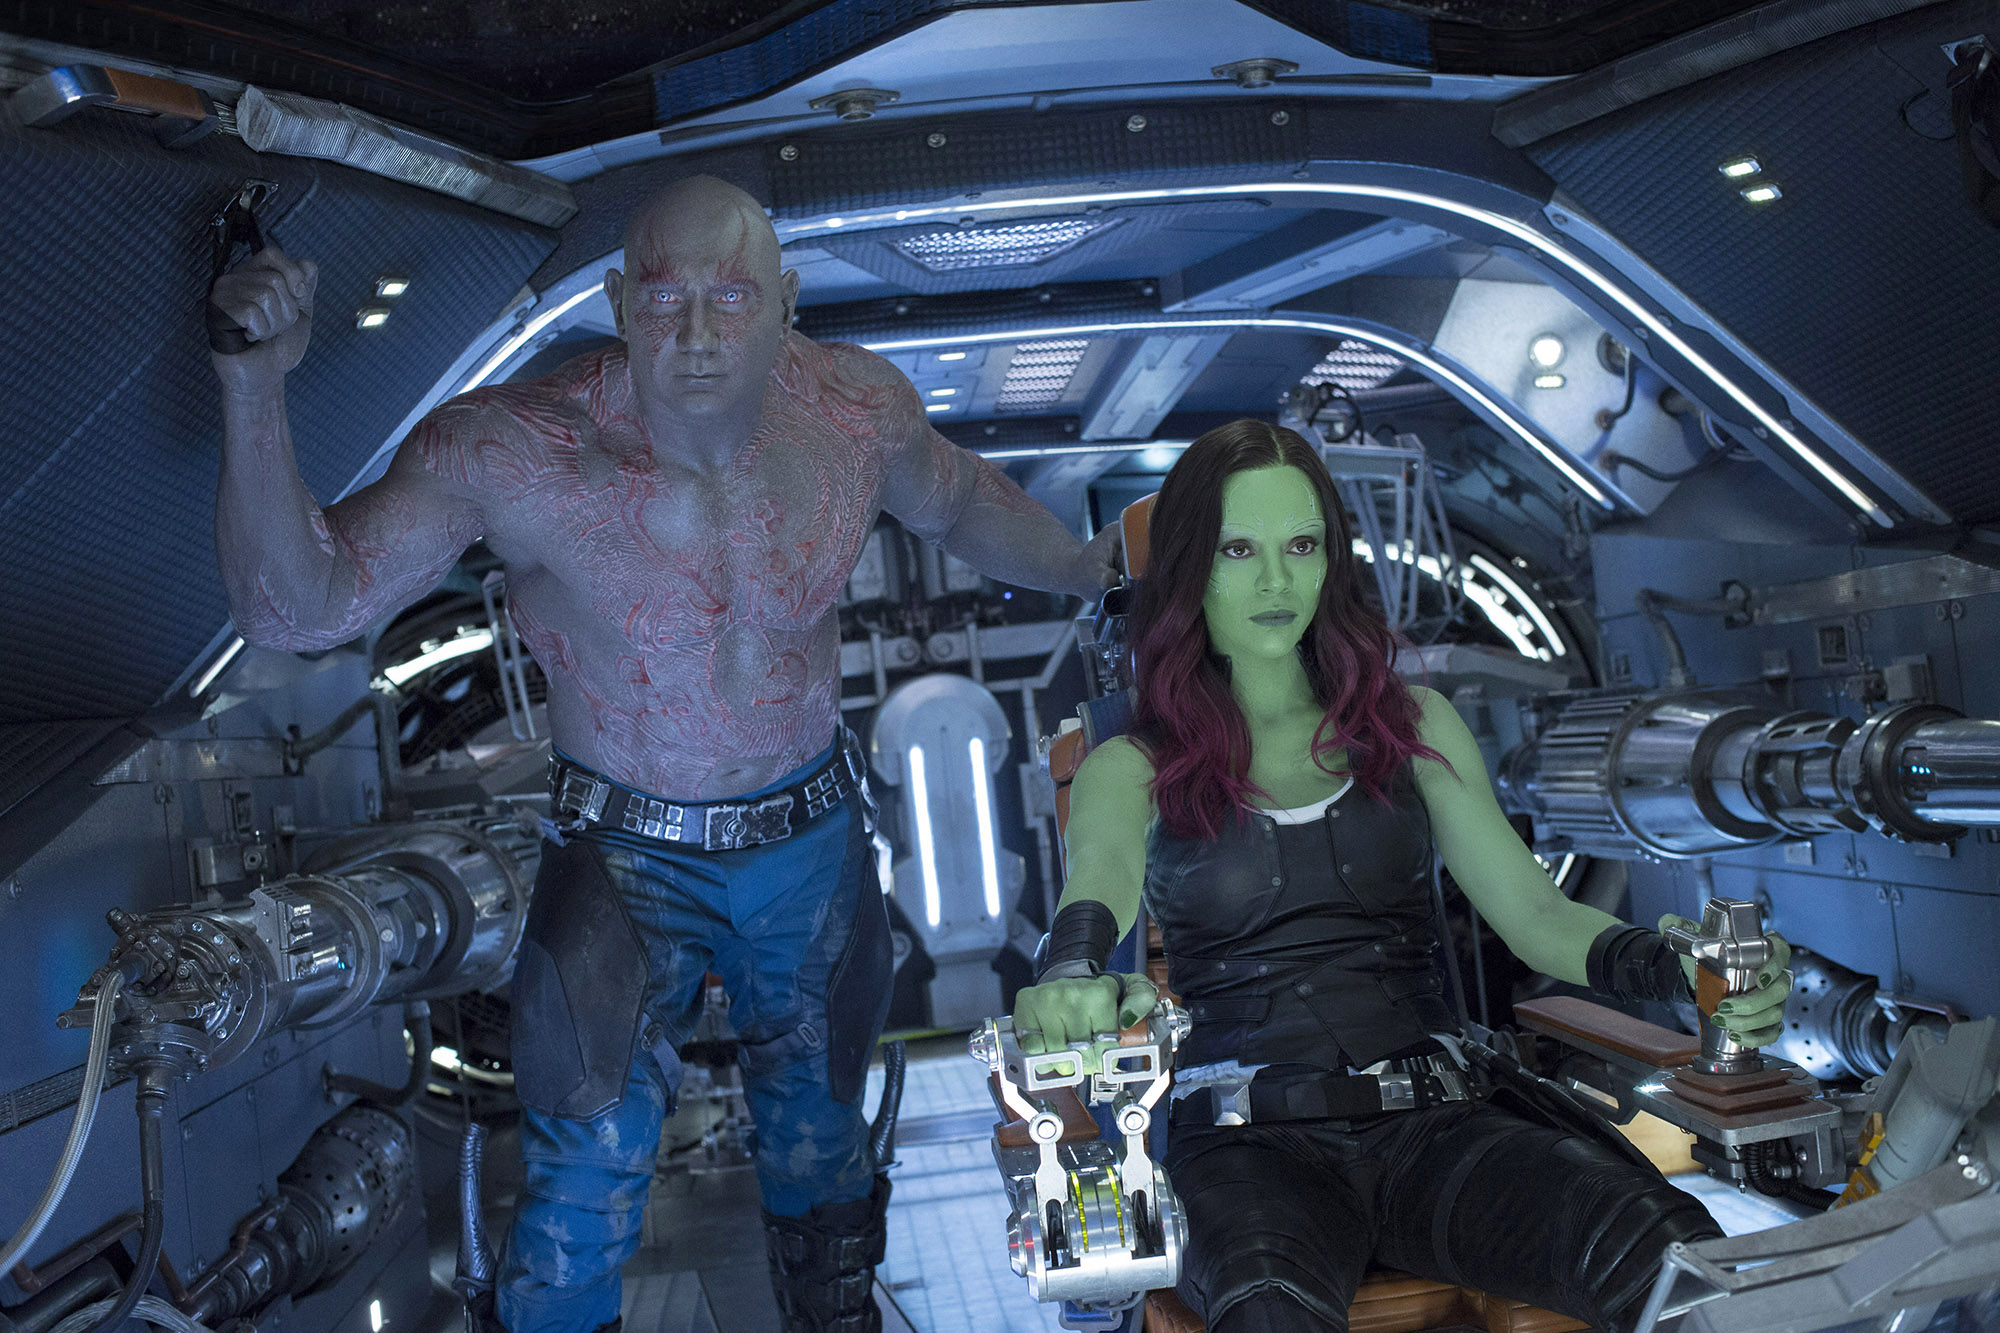 Drax (Dave Bautista) and Gamora (Zoe Saldana) in 'Guardians Of The Galaxy Vol. 2.' MUST CREDIT: Chuck Zlotnick, Marvel Studios